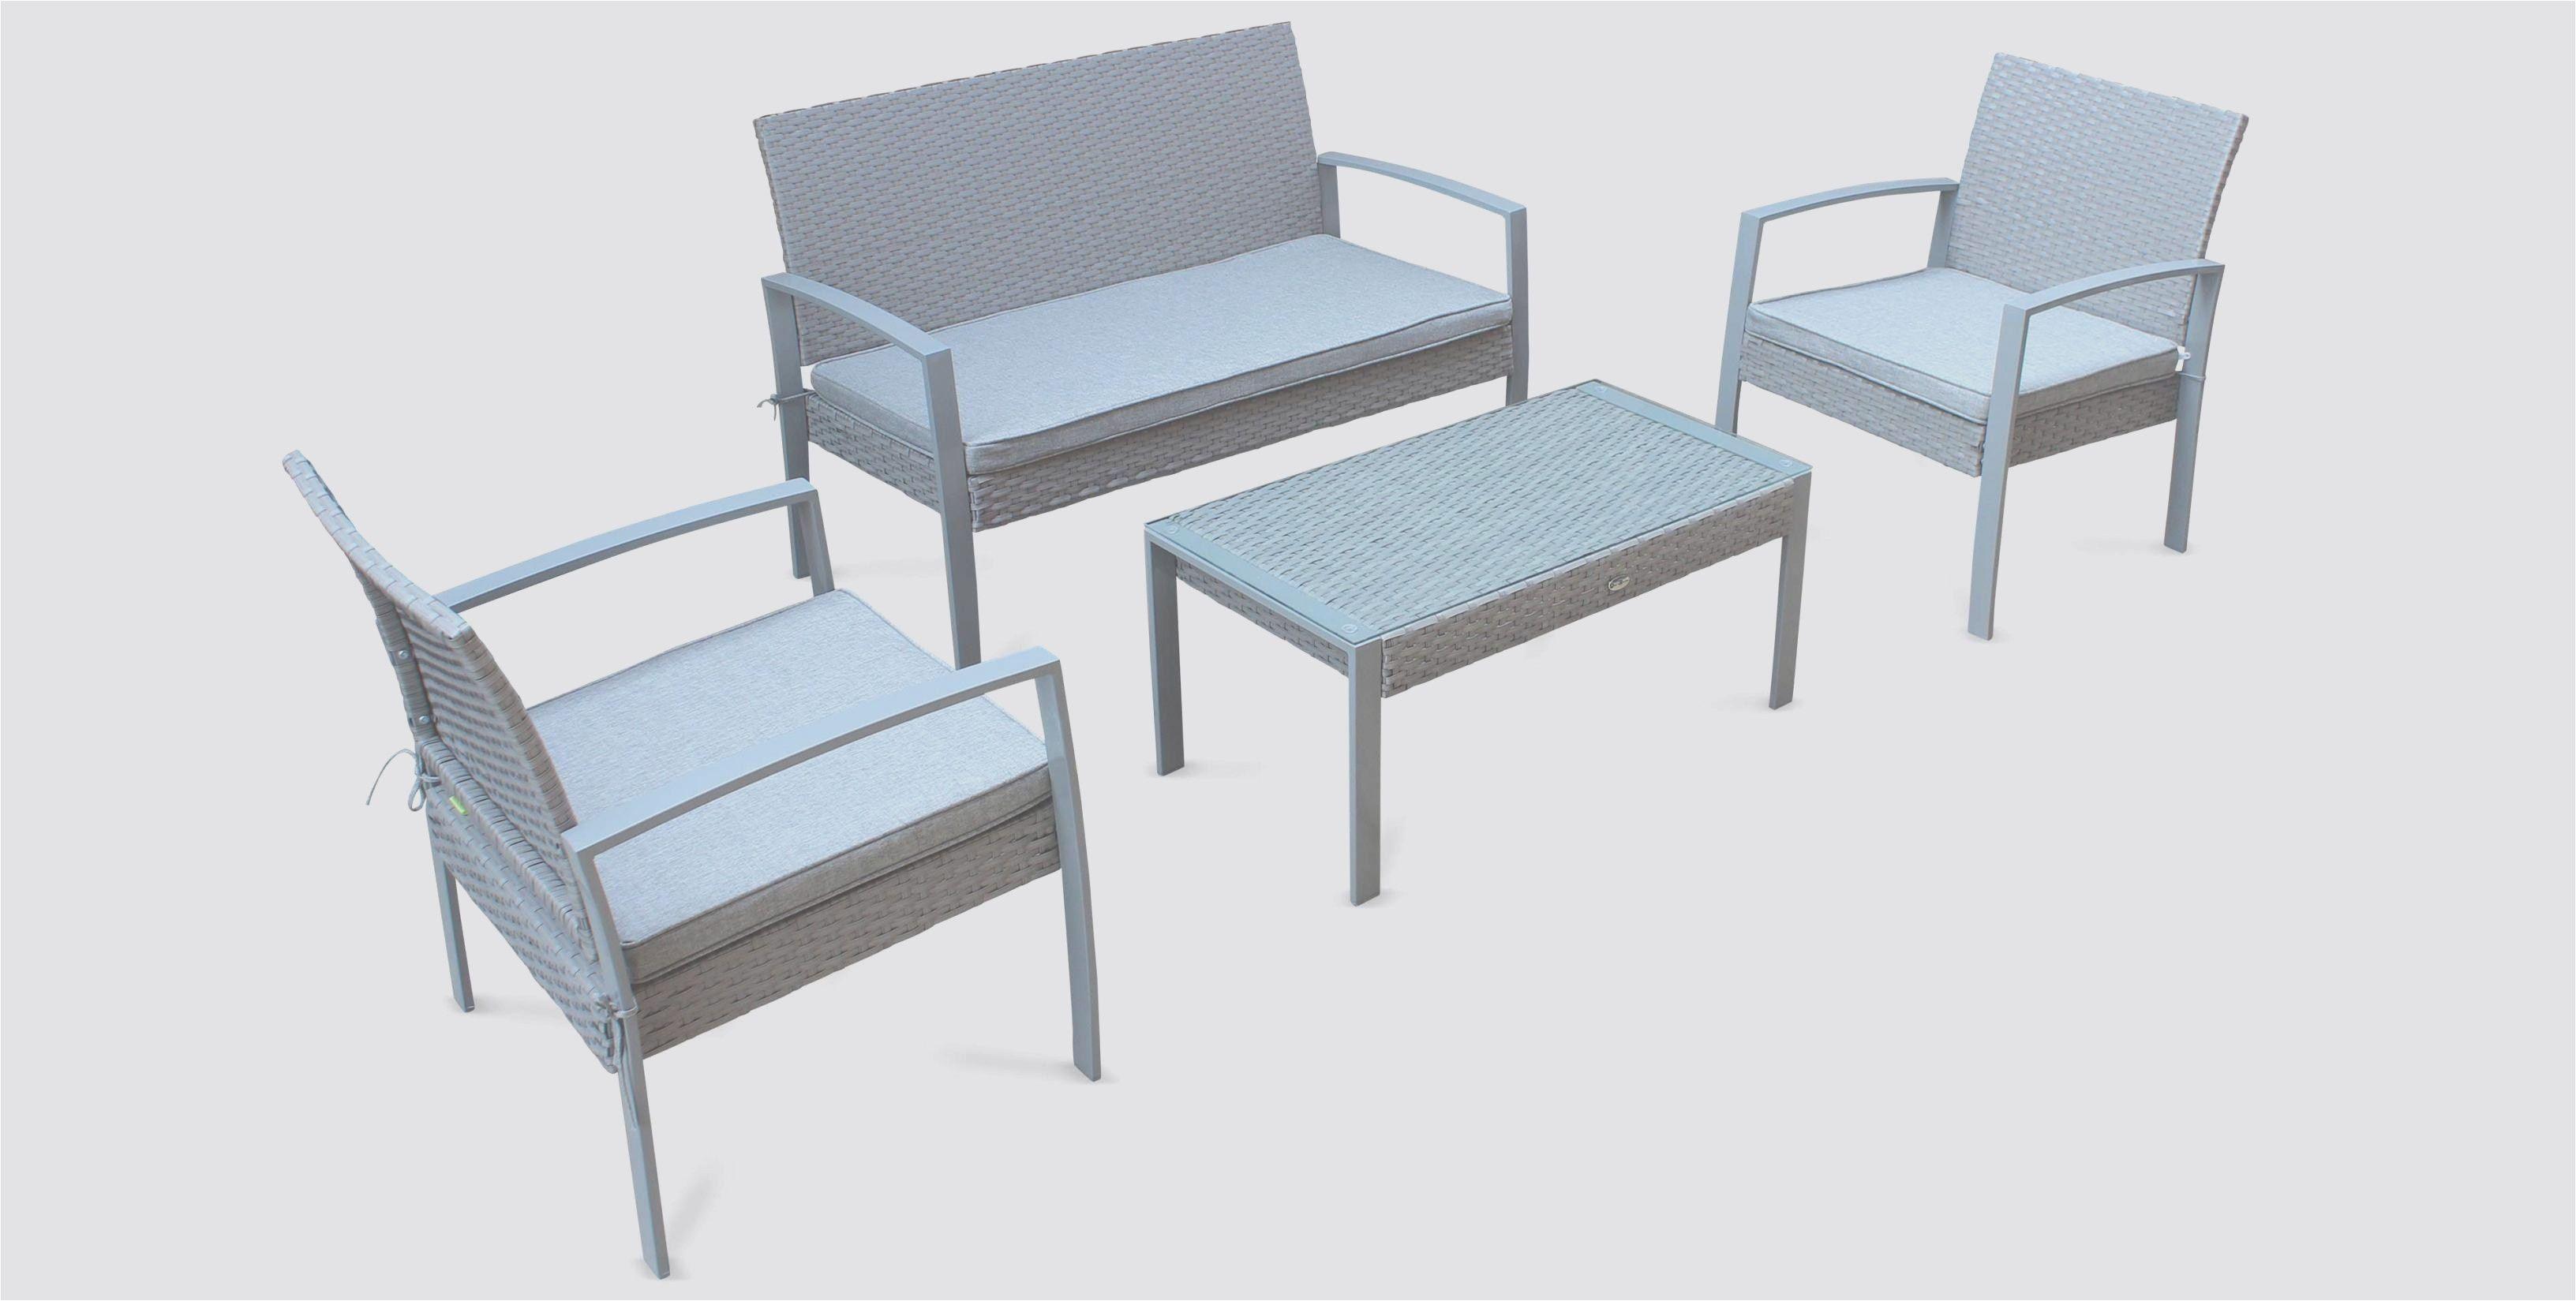 Pin by Ketty Corp on idées de meubles | Kitchen design ...